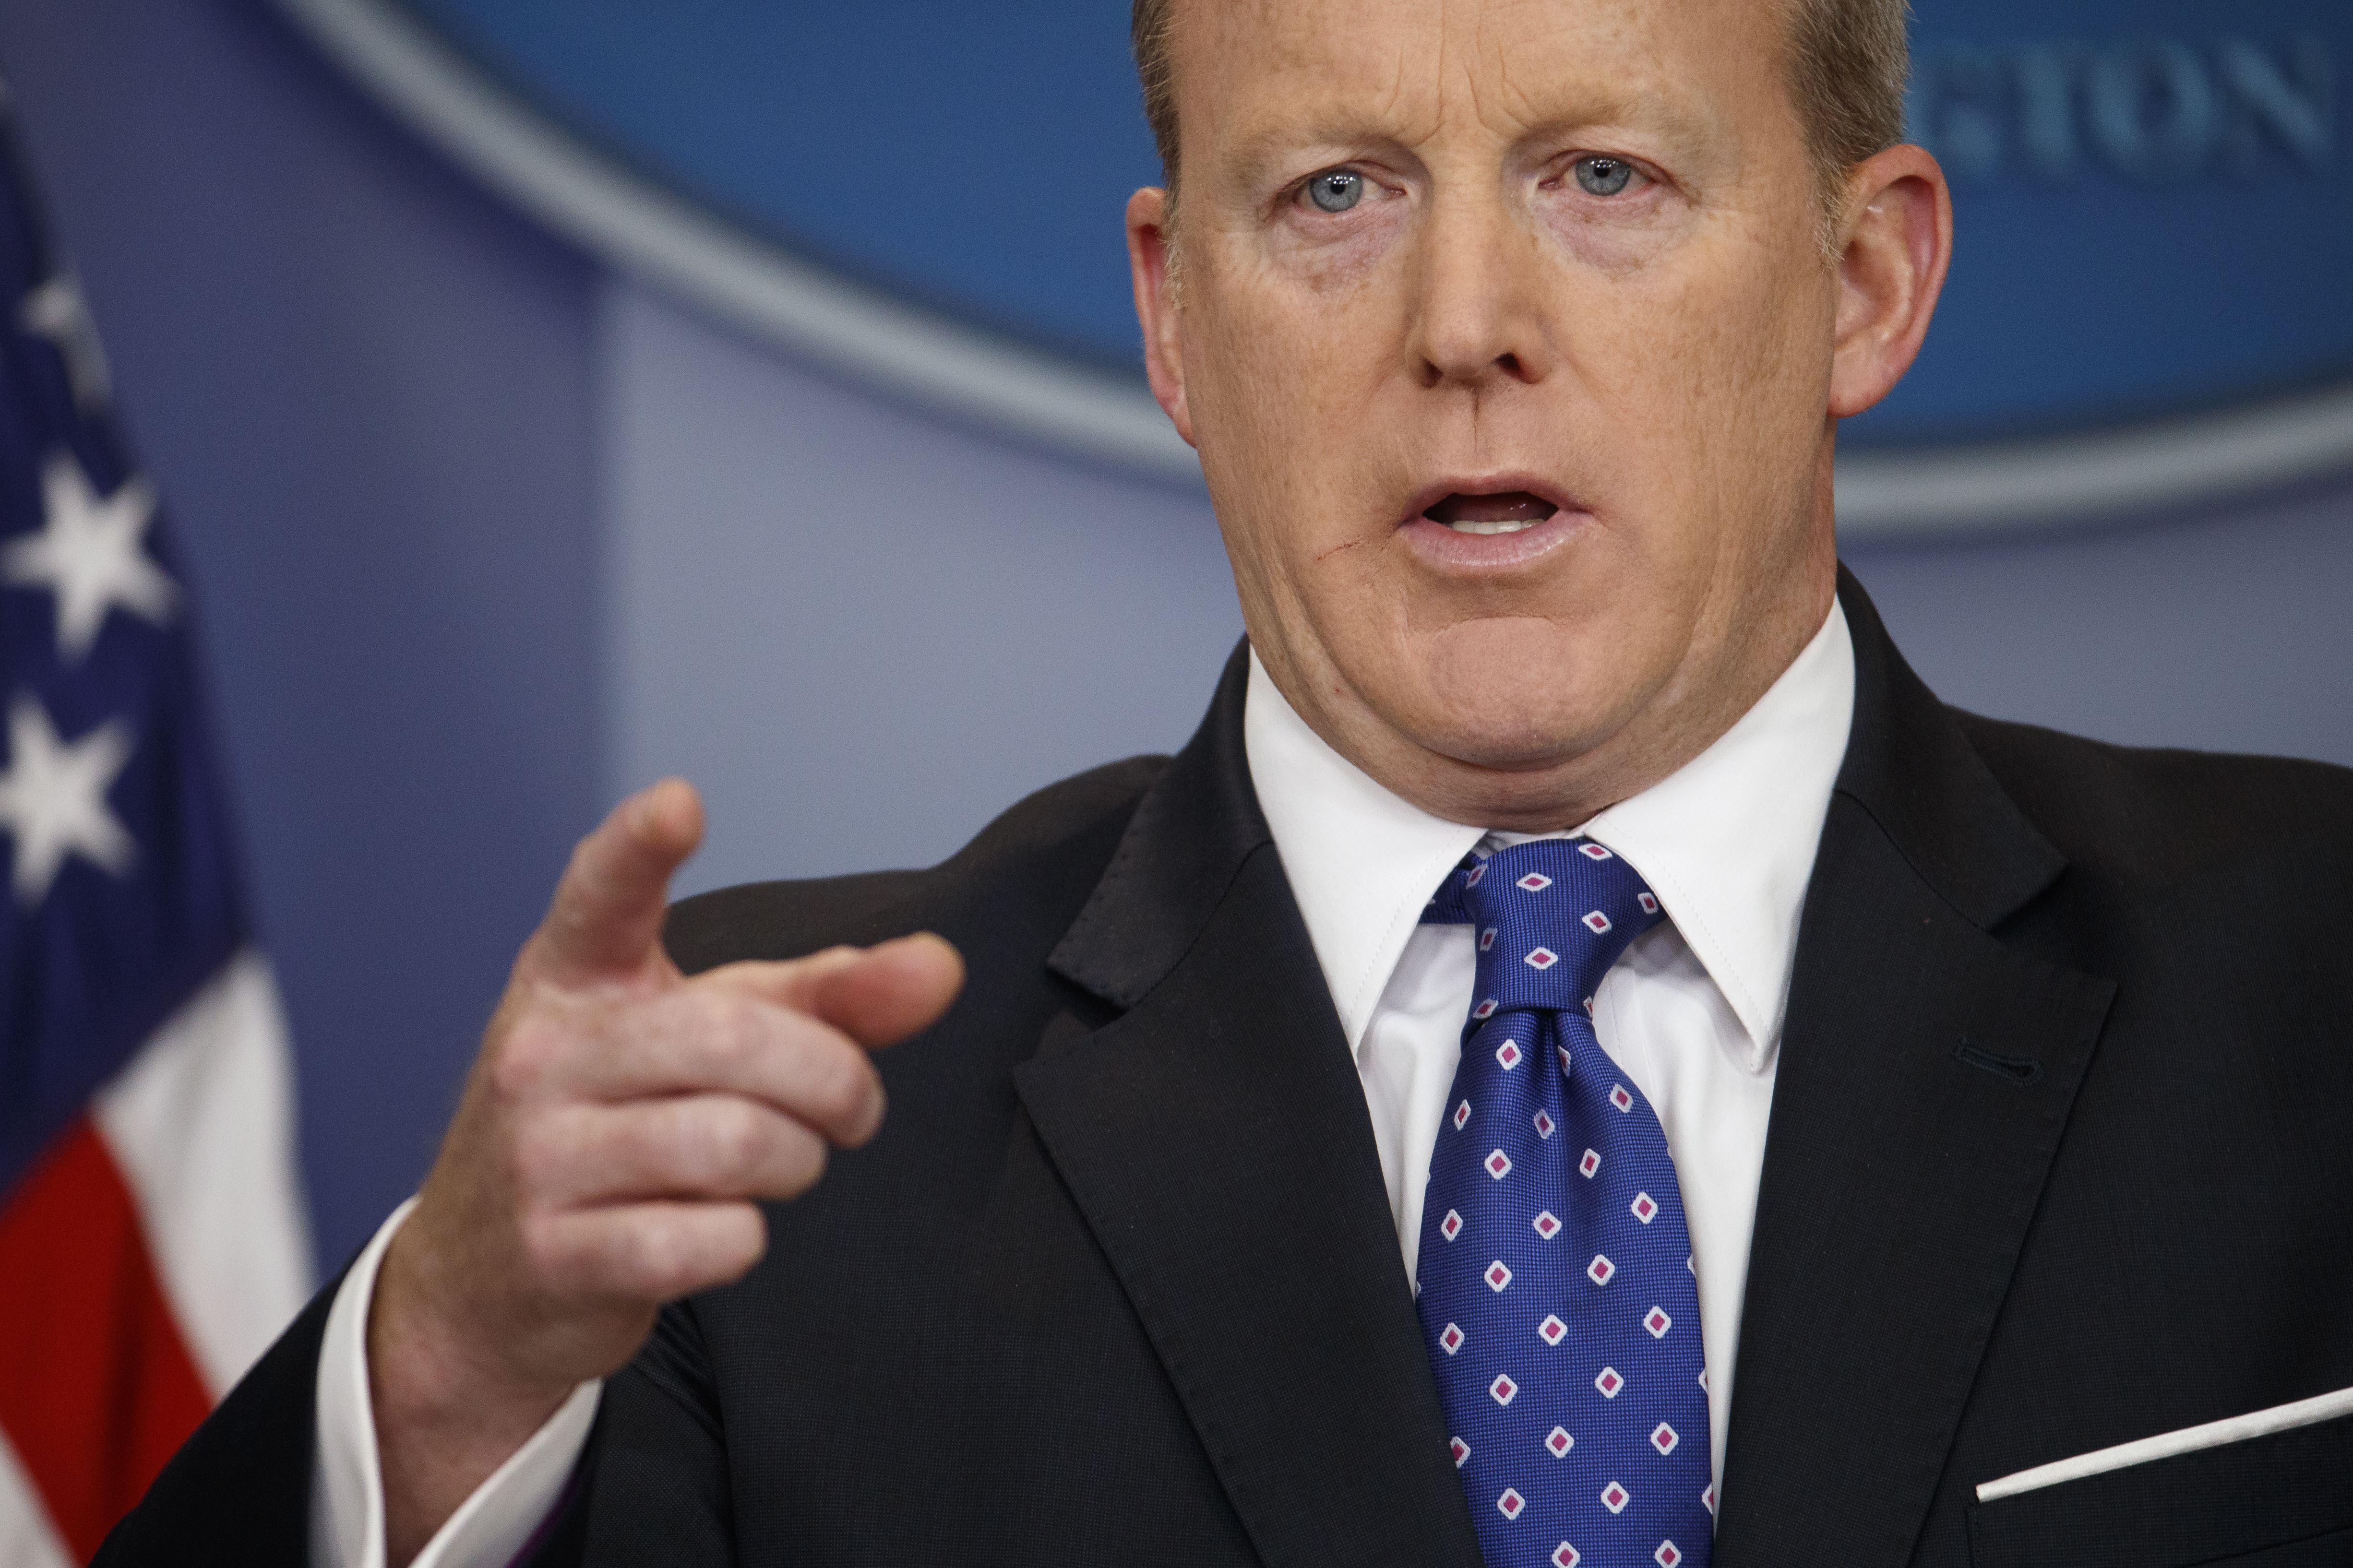 Sean Spicer Steps Down